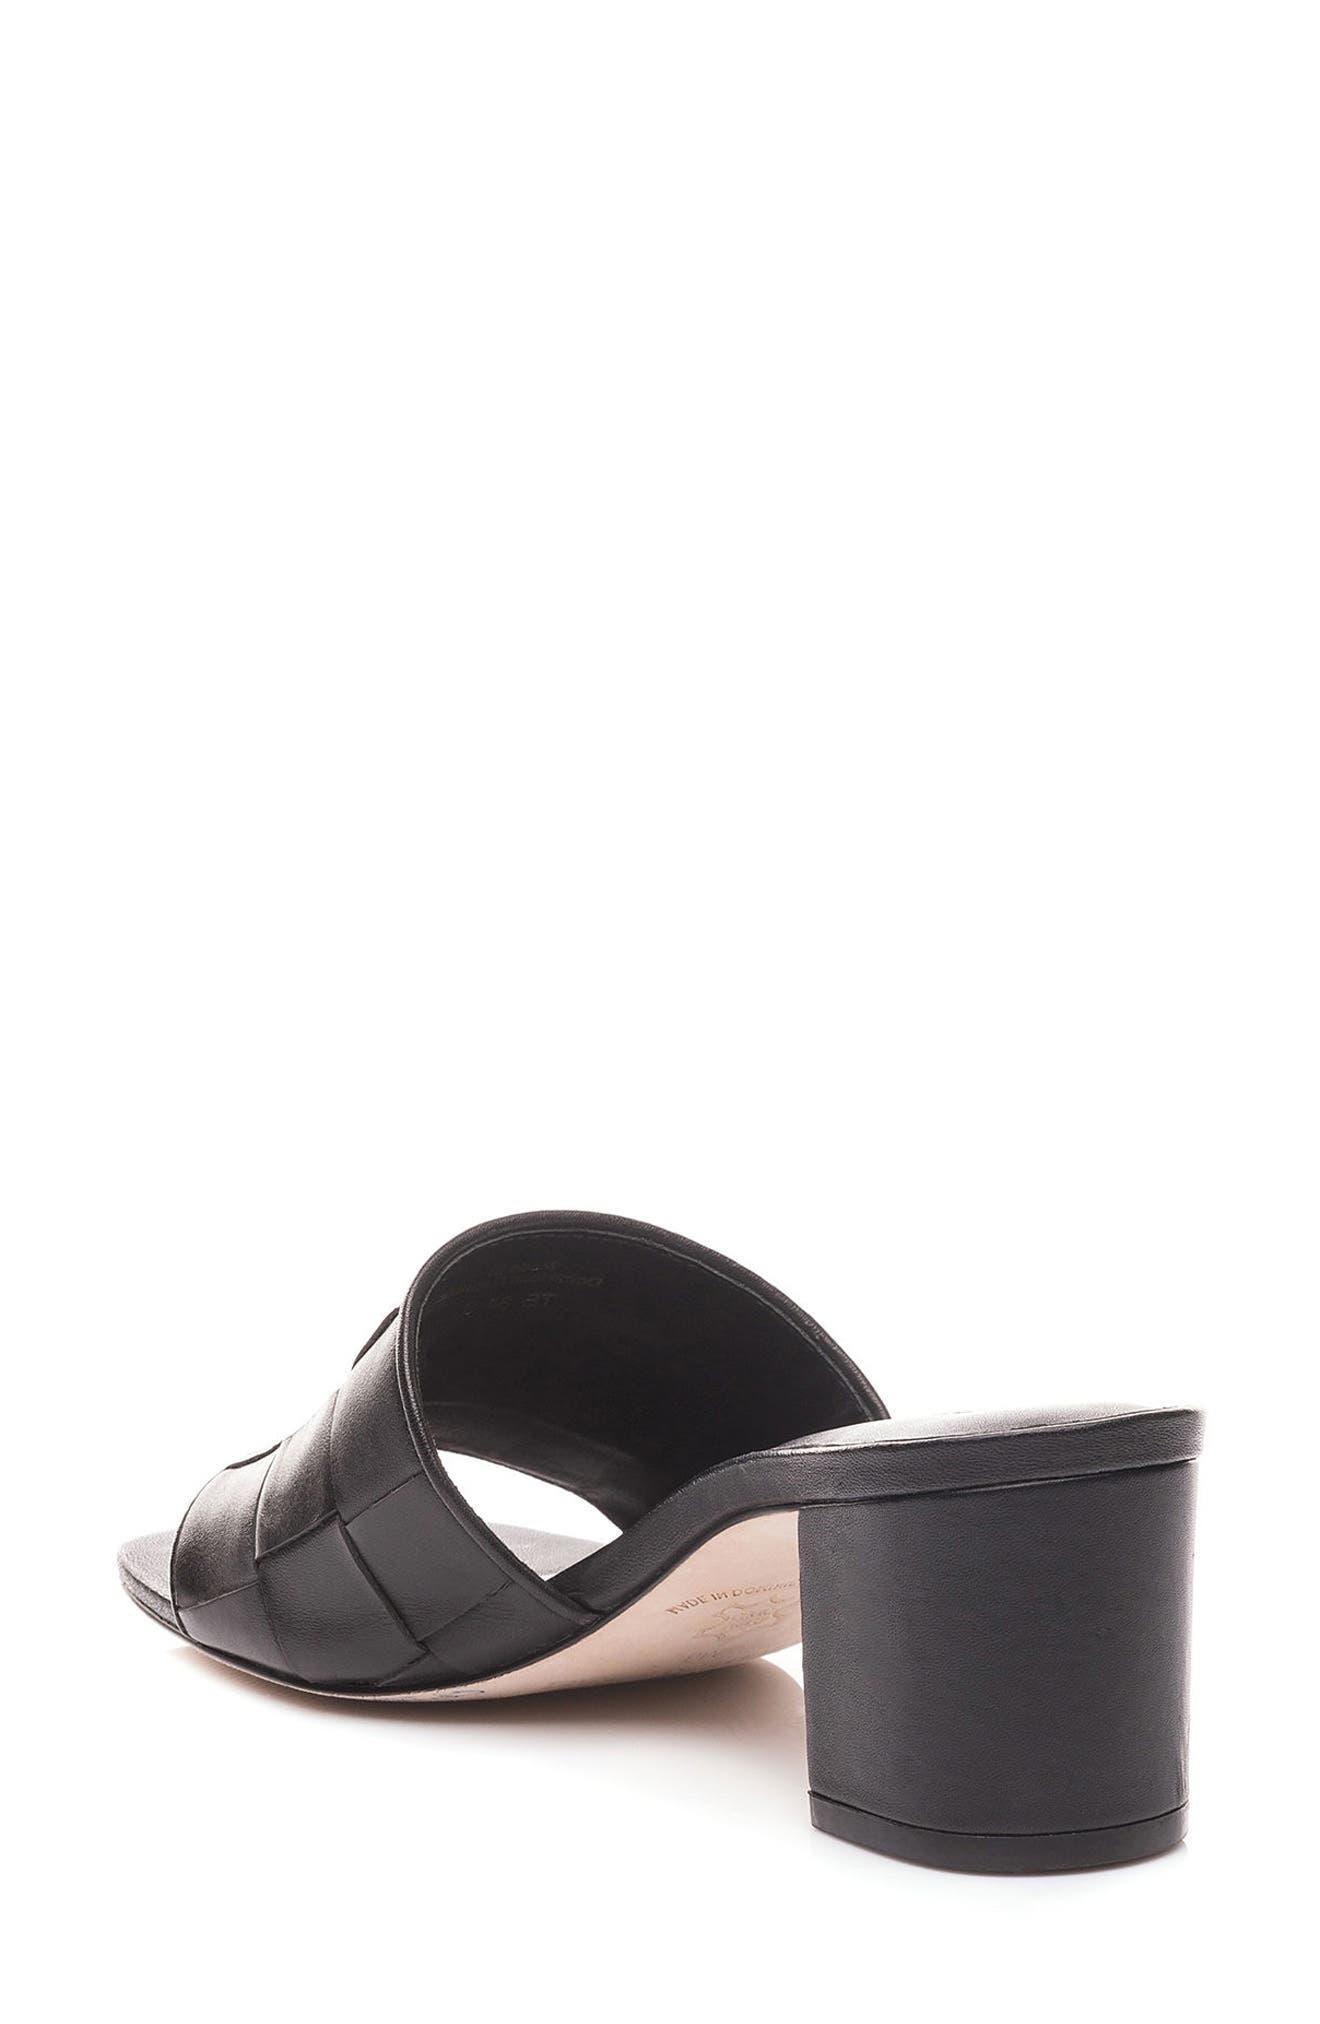 Bernardo Bridget Block Heel Sandal,                             Alternate thumbnail 5, color,